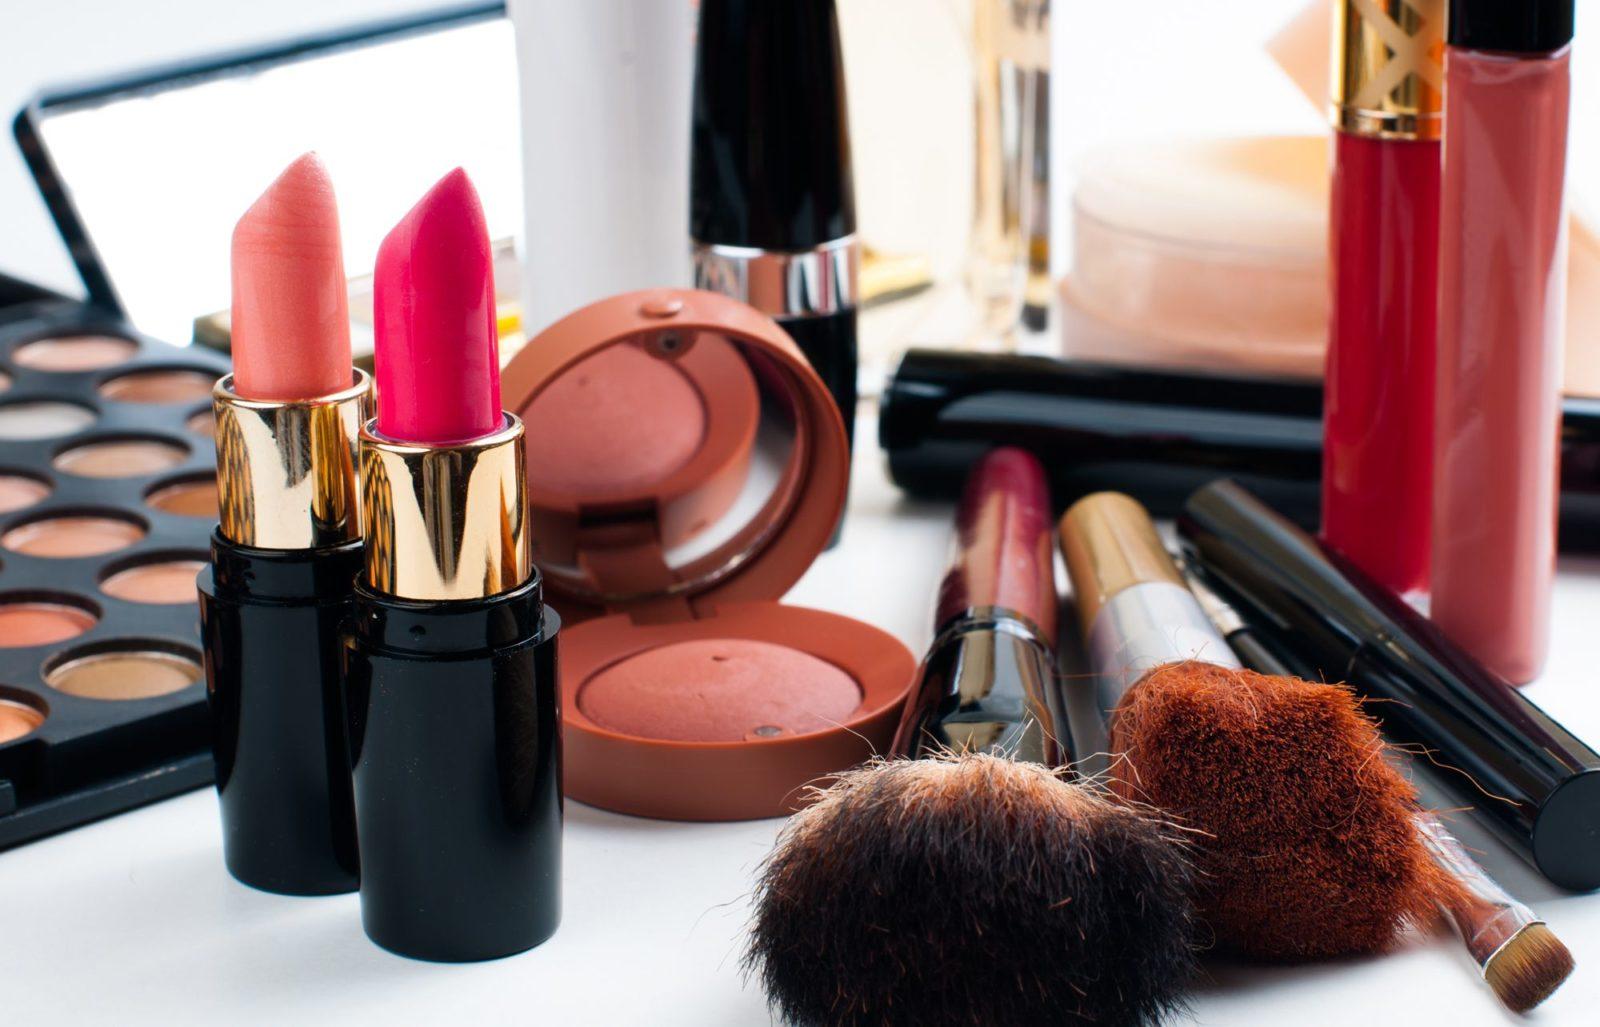 Влияние косметики на здоровье